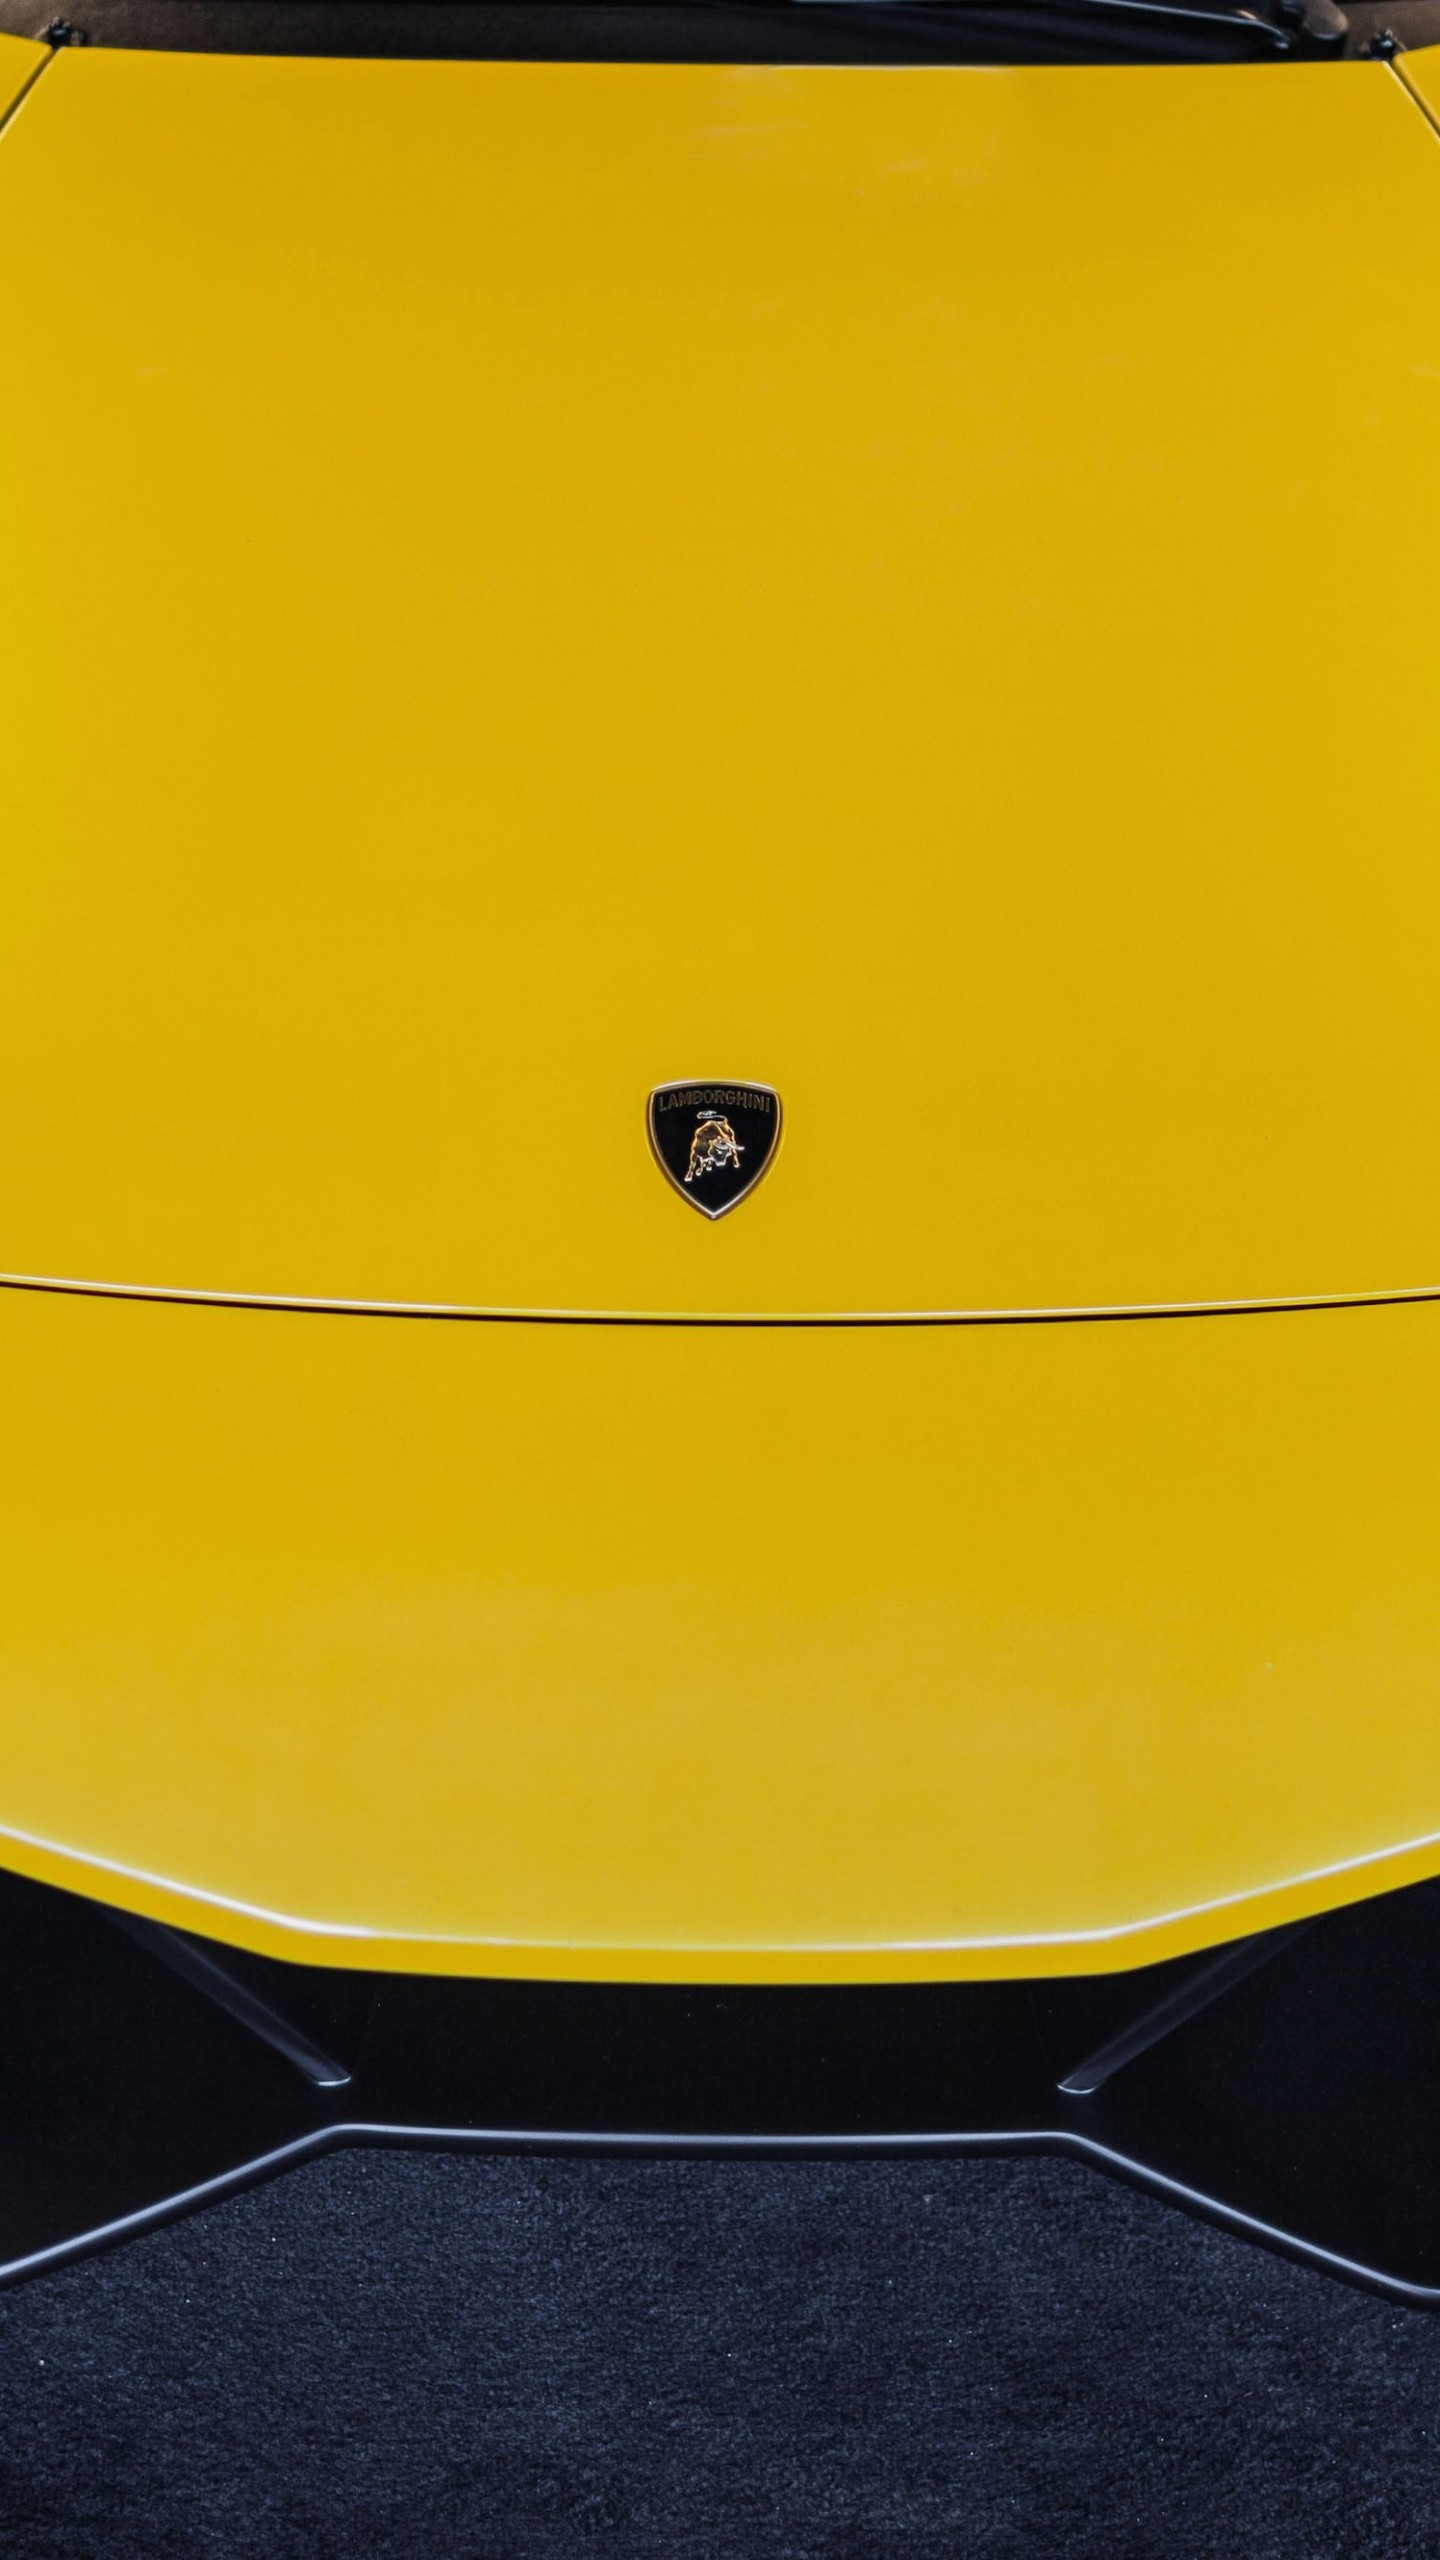 Download Lamborghini Murcielago Lp670 Front Hd Wallpaper